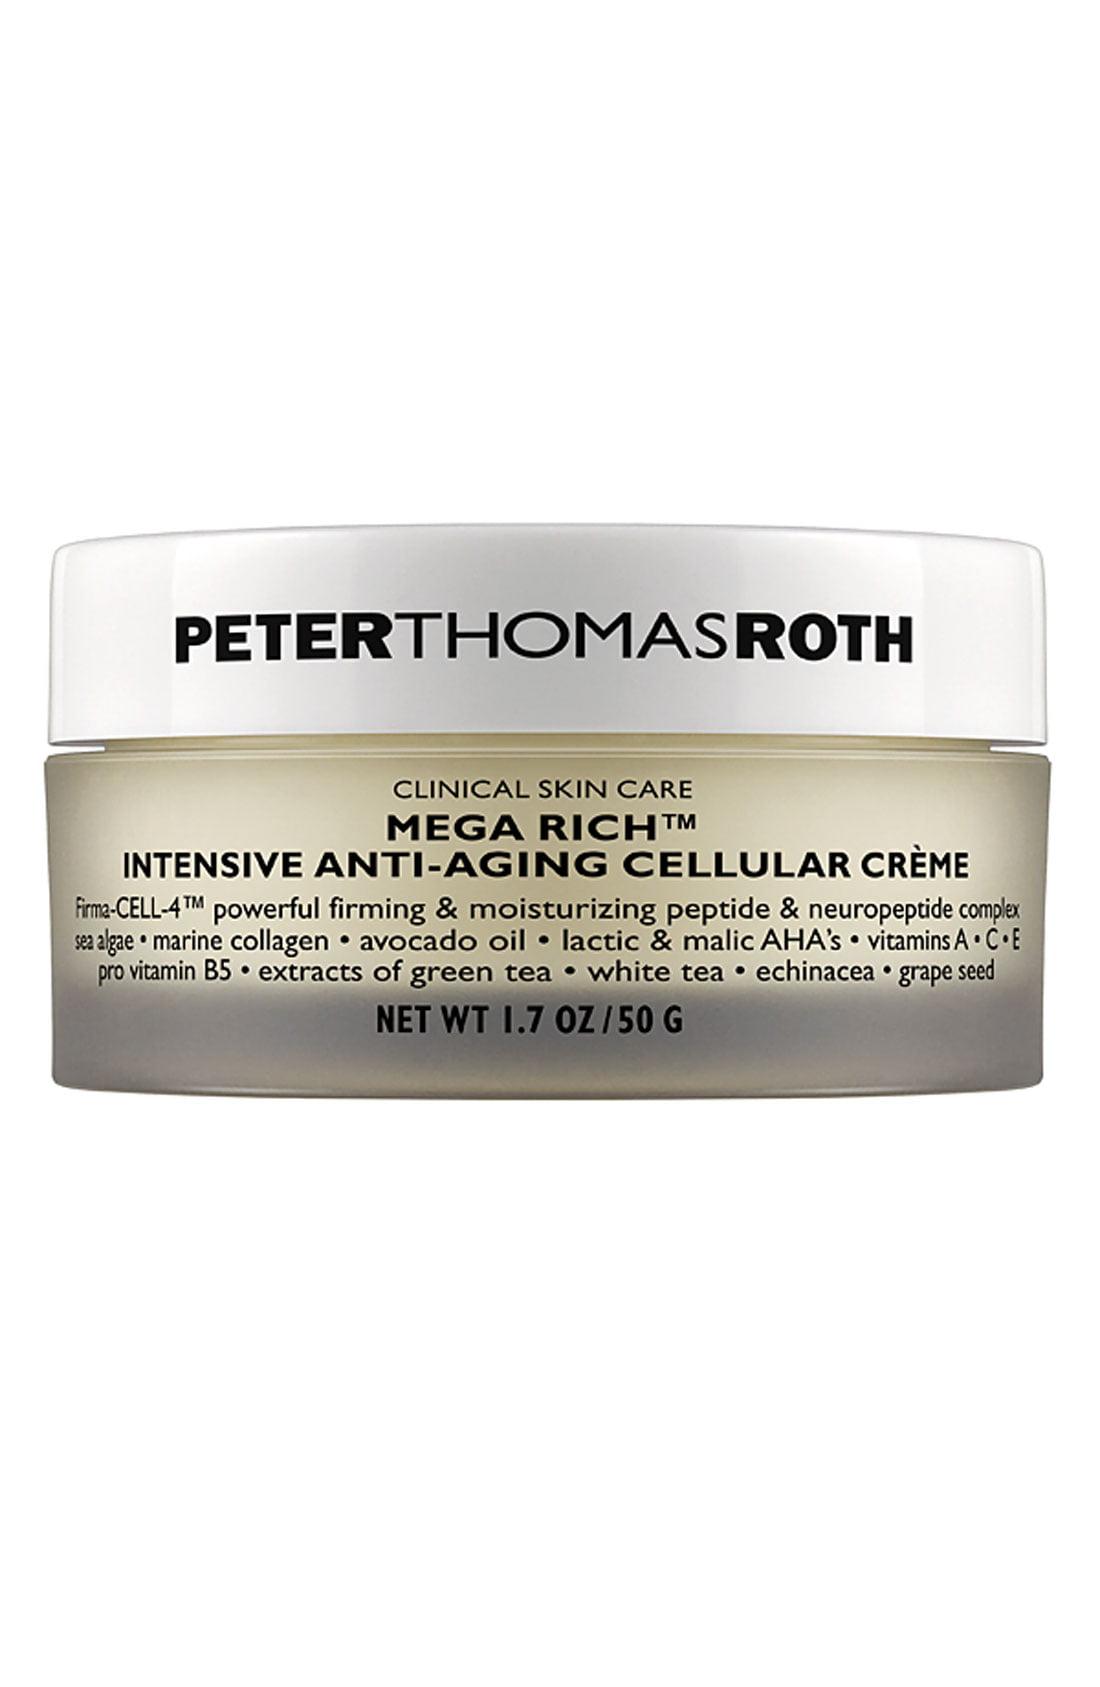 Mega Rich Intensive Anti-aging Cellular Creme